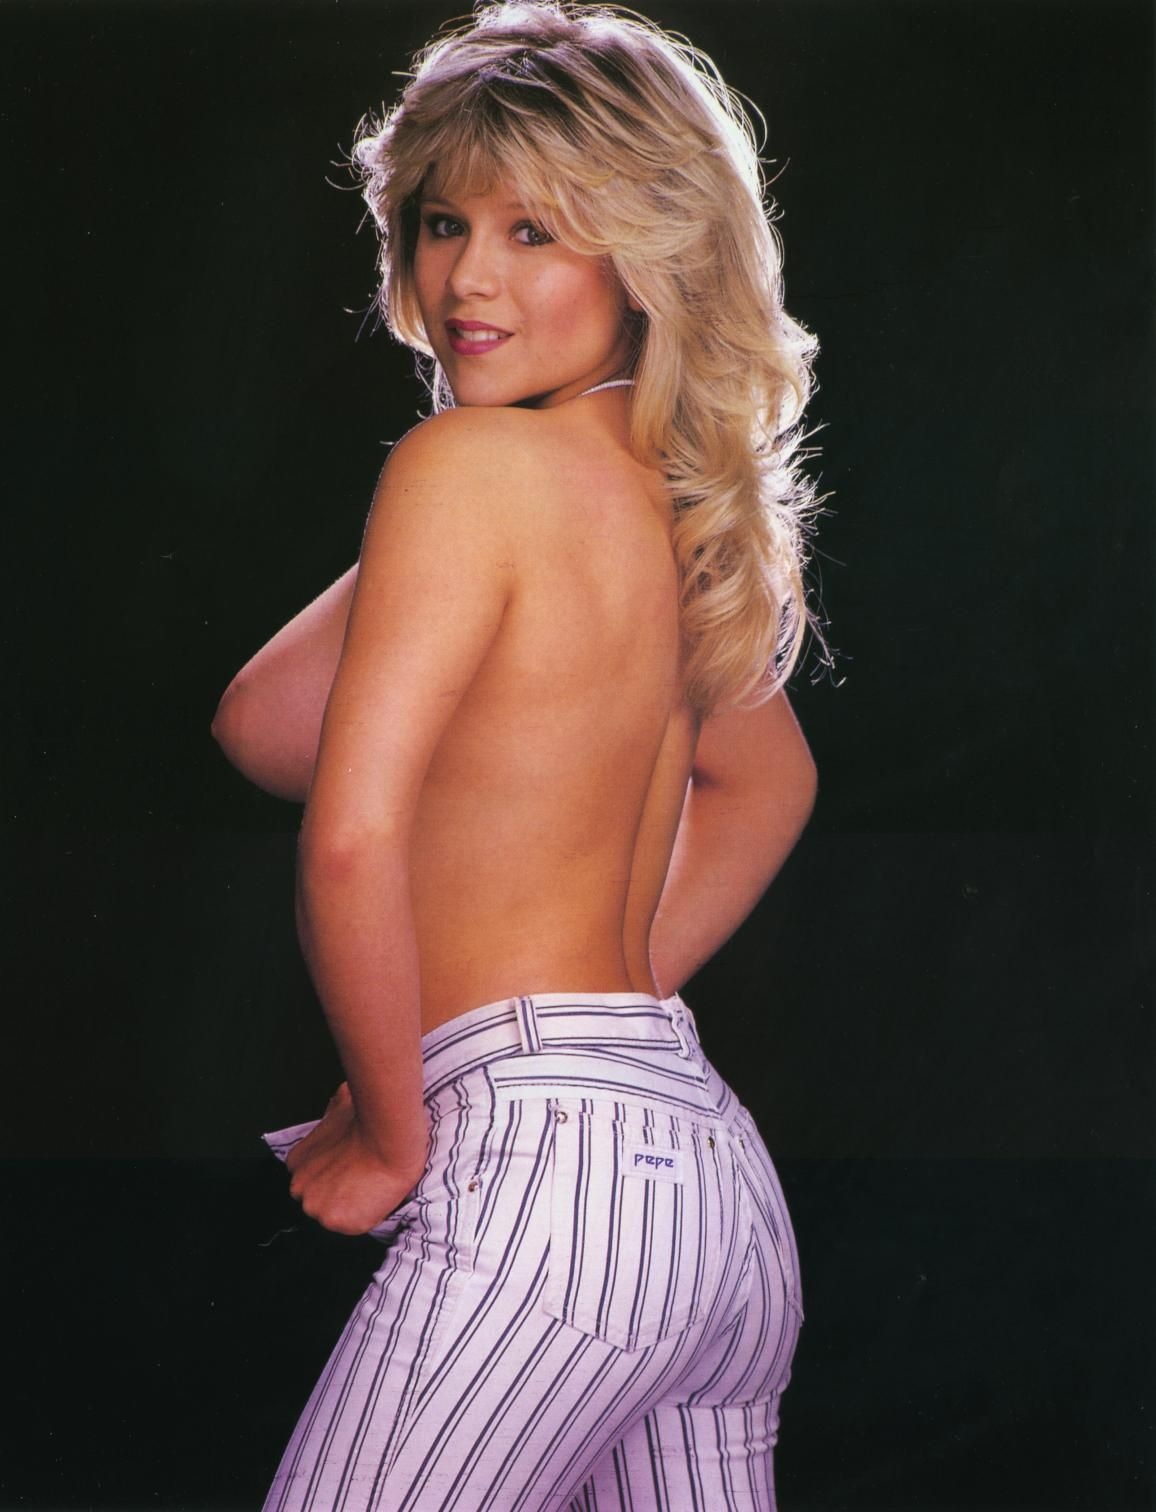 Samantha Fox nudes (67 photo), Topless, Paparazzi, Boobs, lingerie 2006